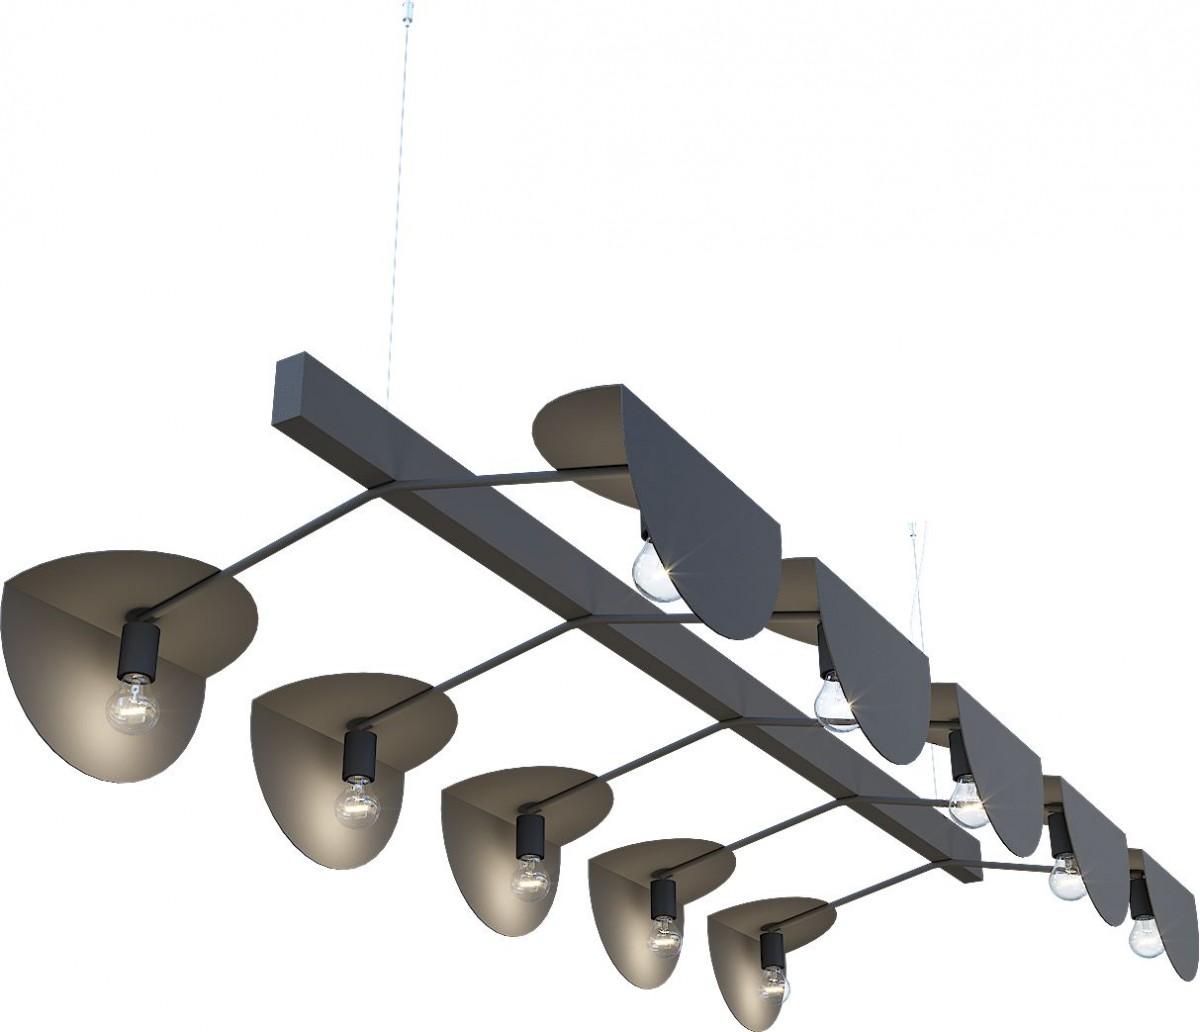 Гемера L1500 B400 H250 Лампы: 10 х Е27